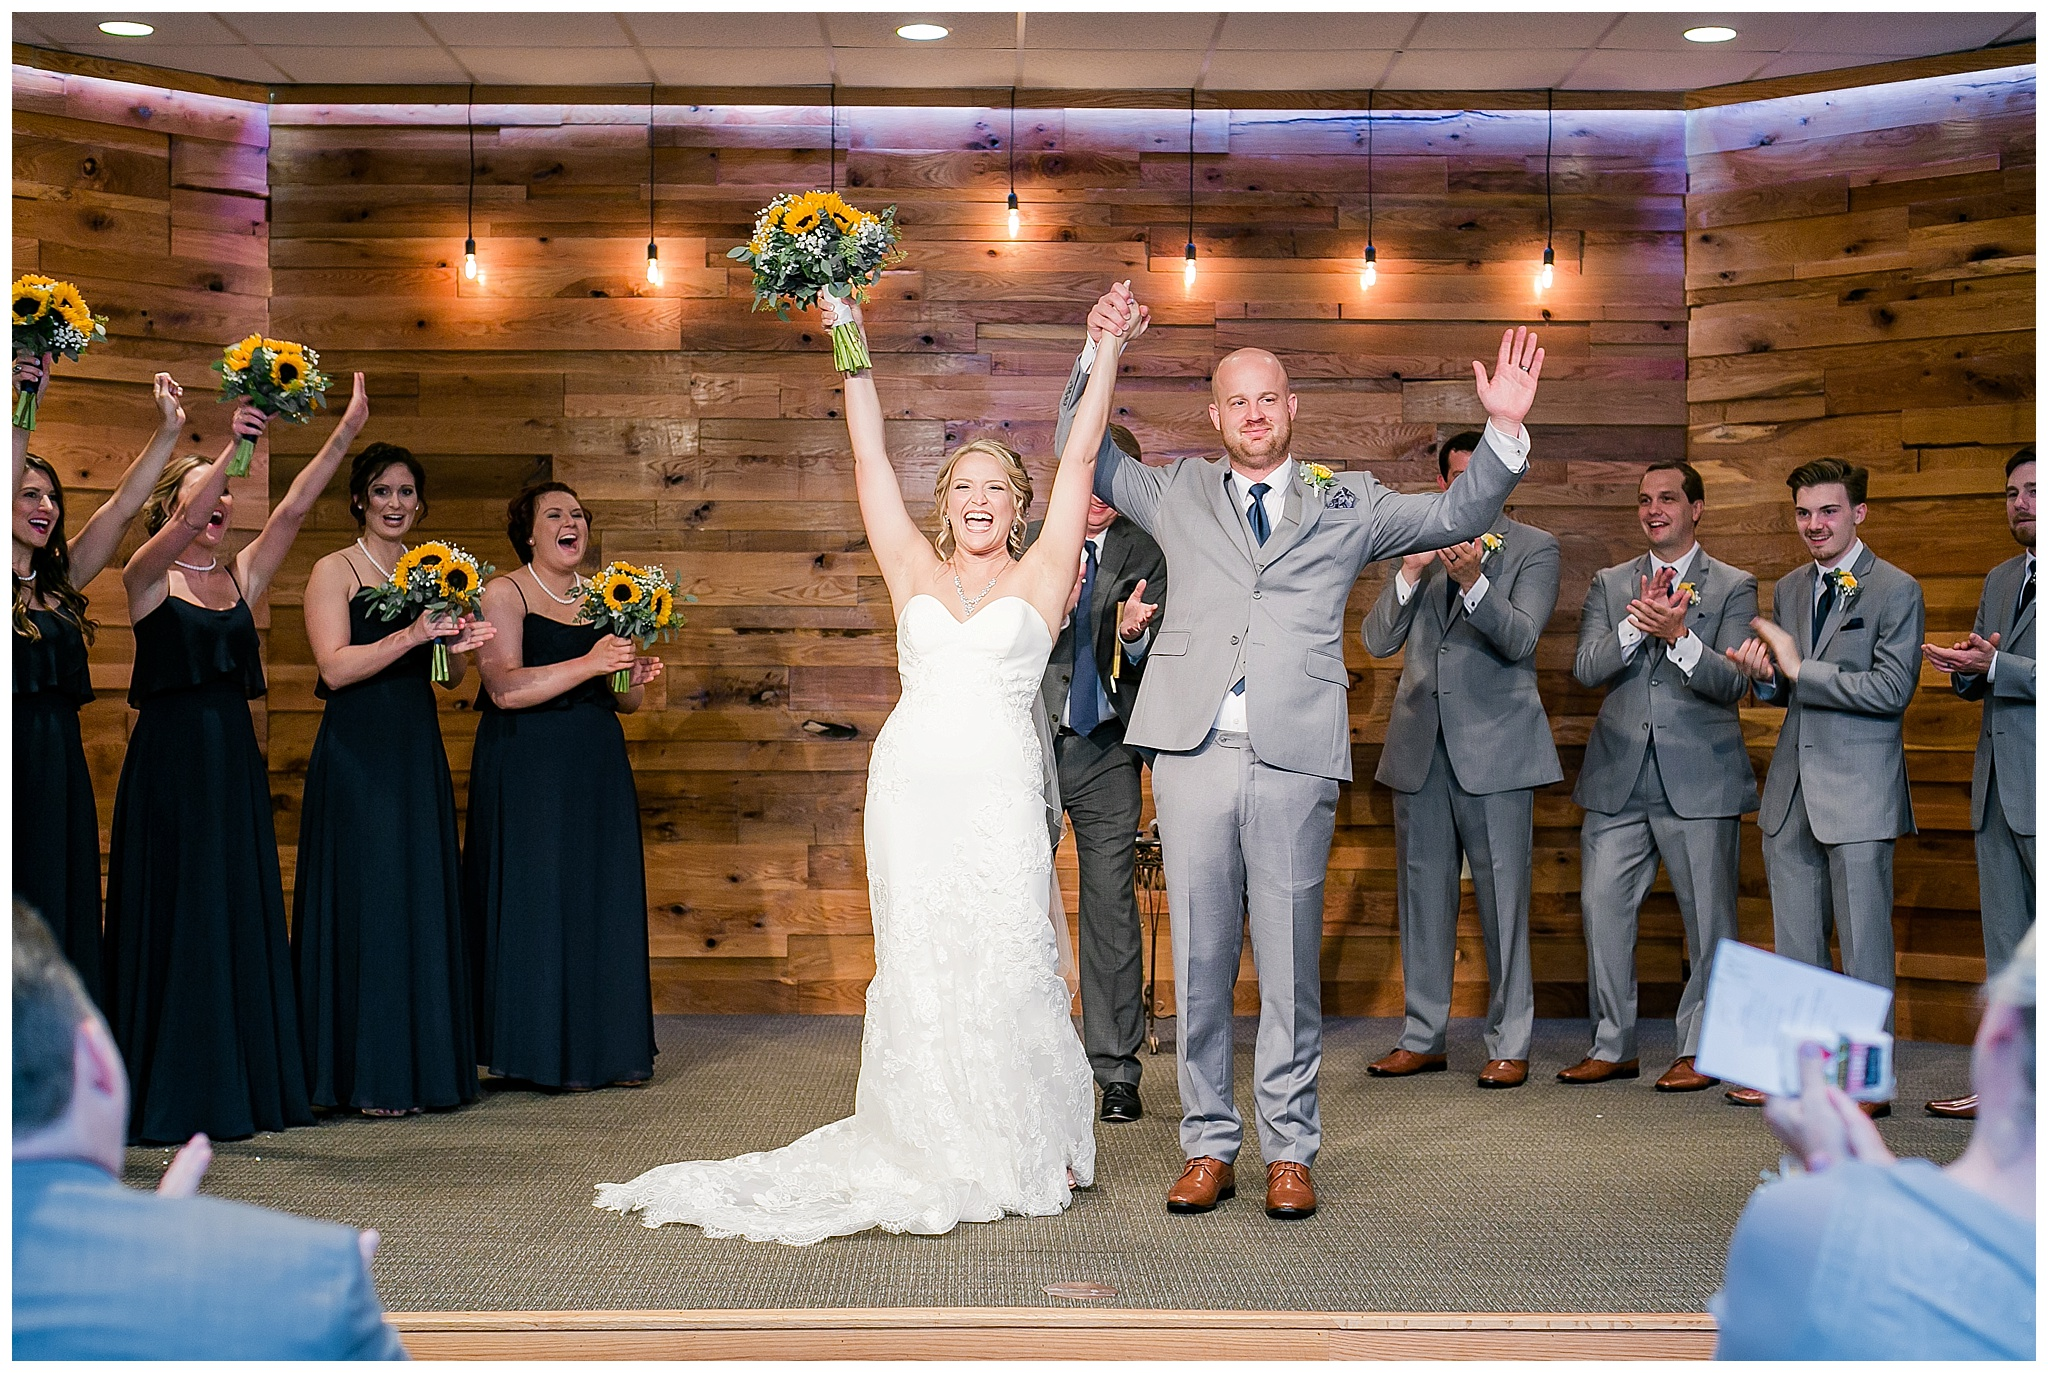 Venue_at_Milwaukee_Brewing_Company_wedding_milwaukee_wisconsin_0341.jpg